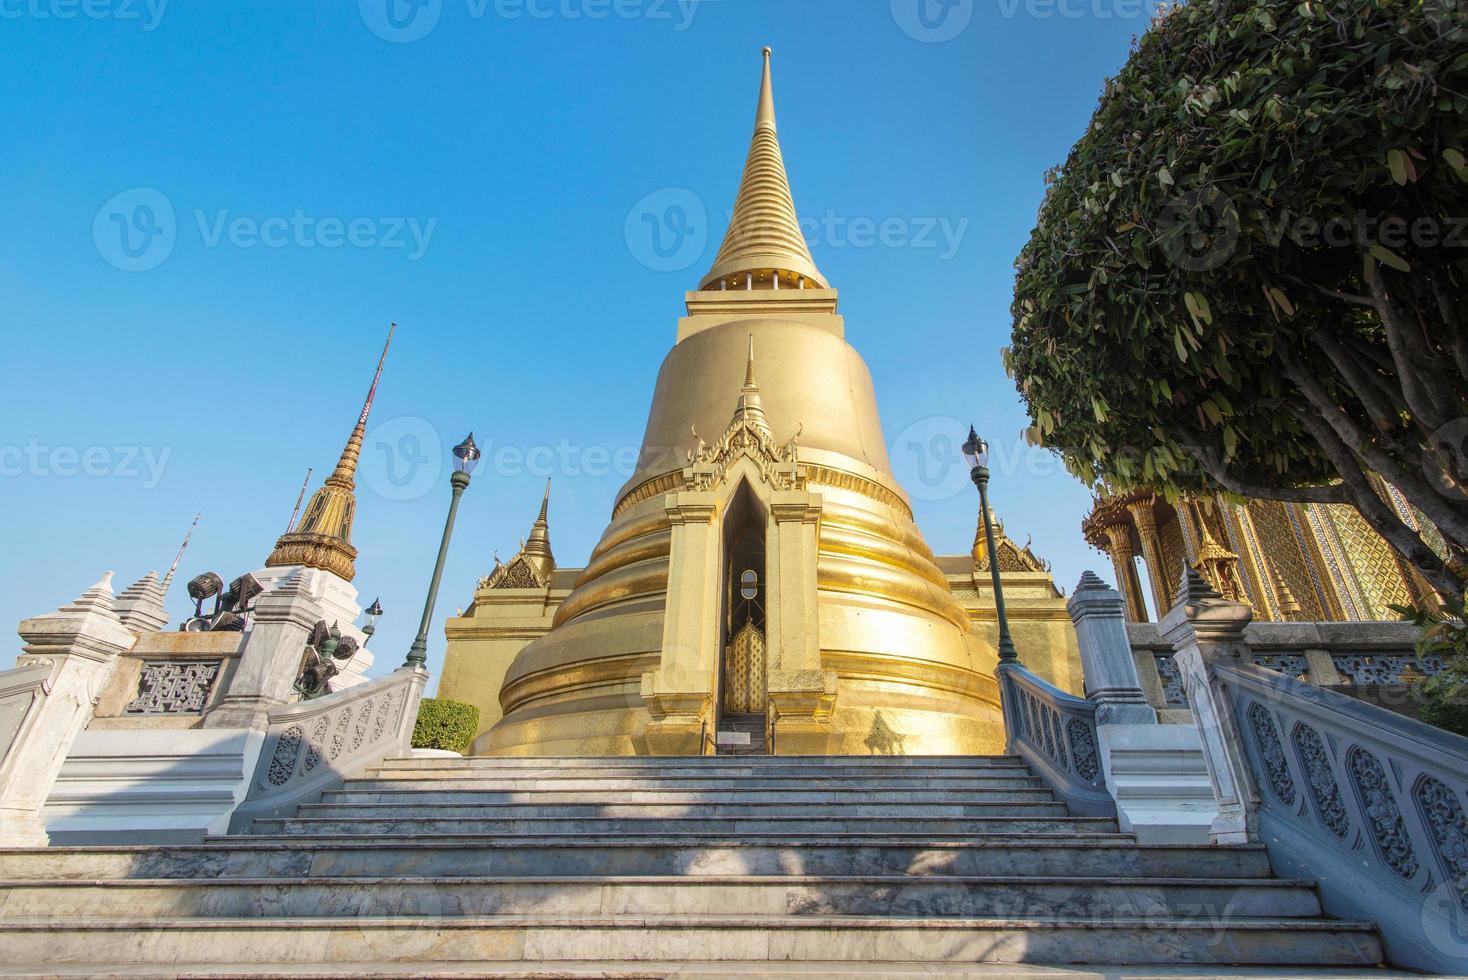 em phra kaeo, templo da esmeralda buddha, bangkok tailândia. foto